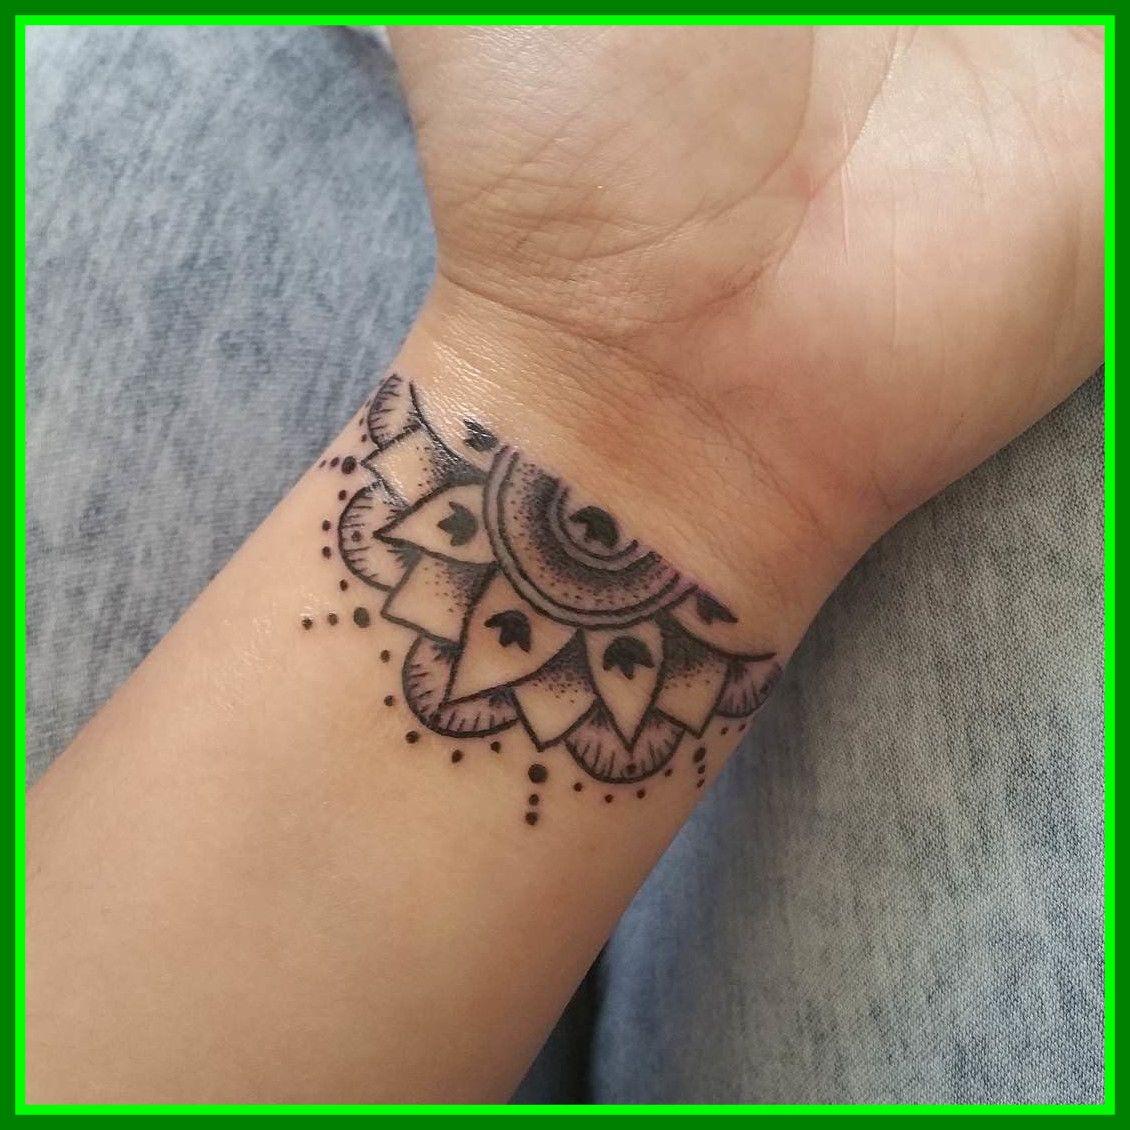 Inspiring Small Wrist Tips U Ideas For Tattoo Designs Name